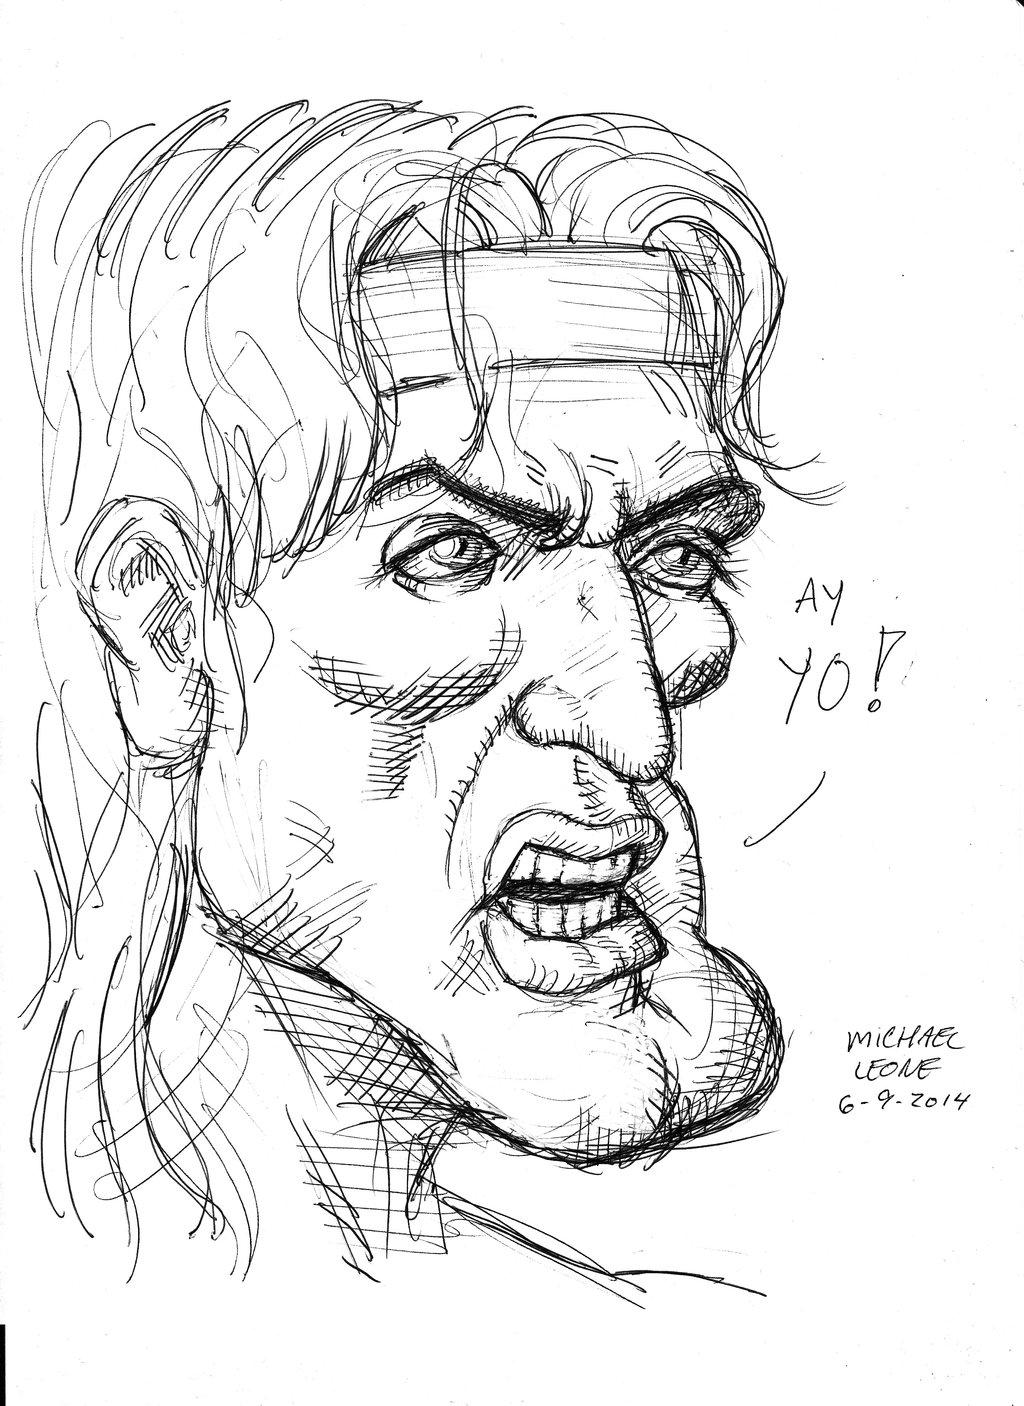 1024x1406 Rambo 6 9 2014 By Myconius